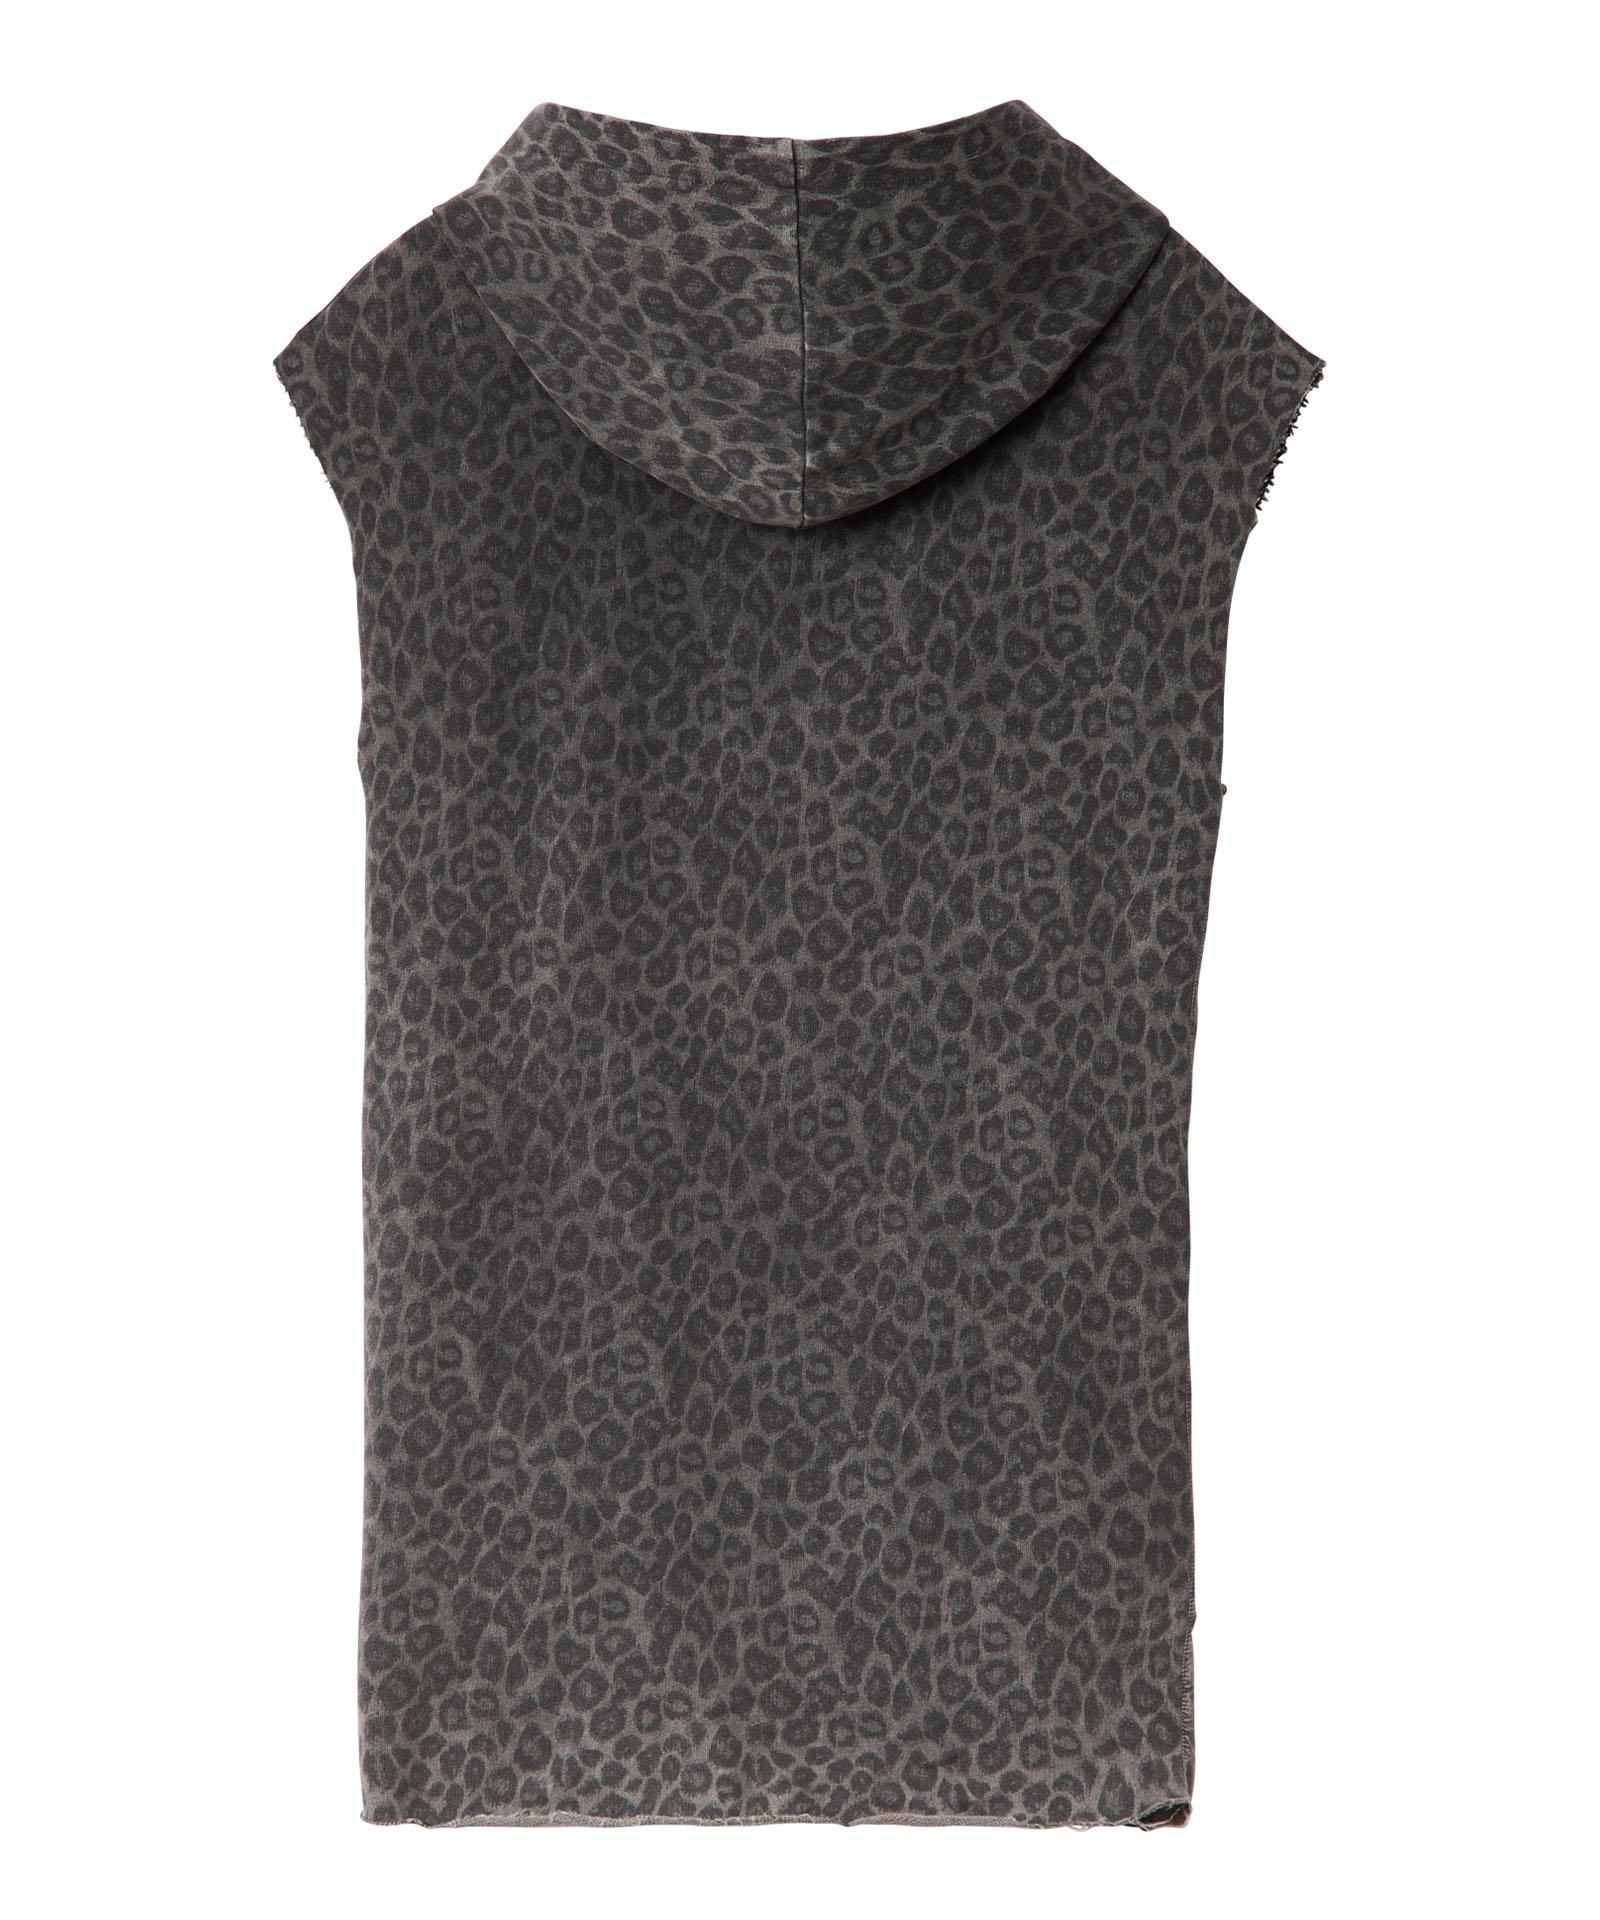 Jurk hoodie fade out leopard Pavement Kklup